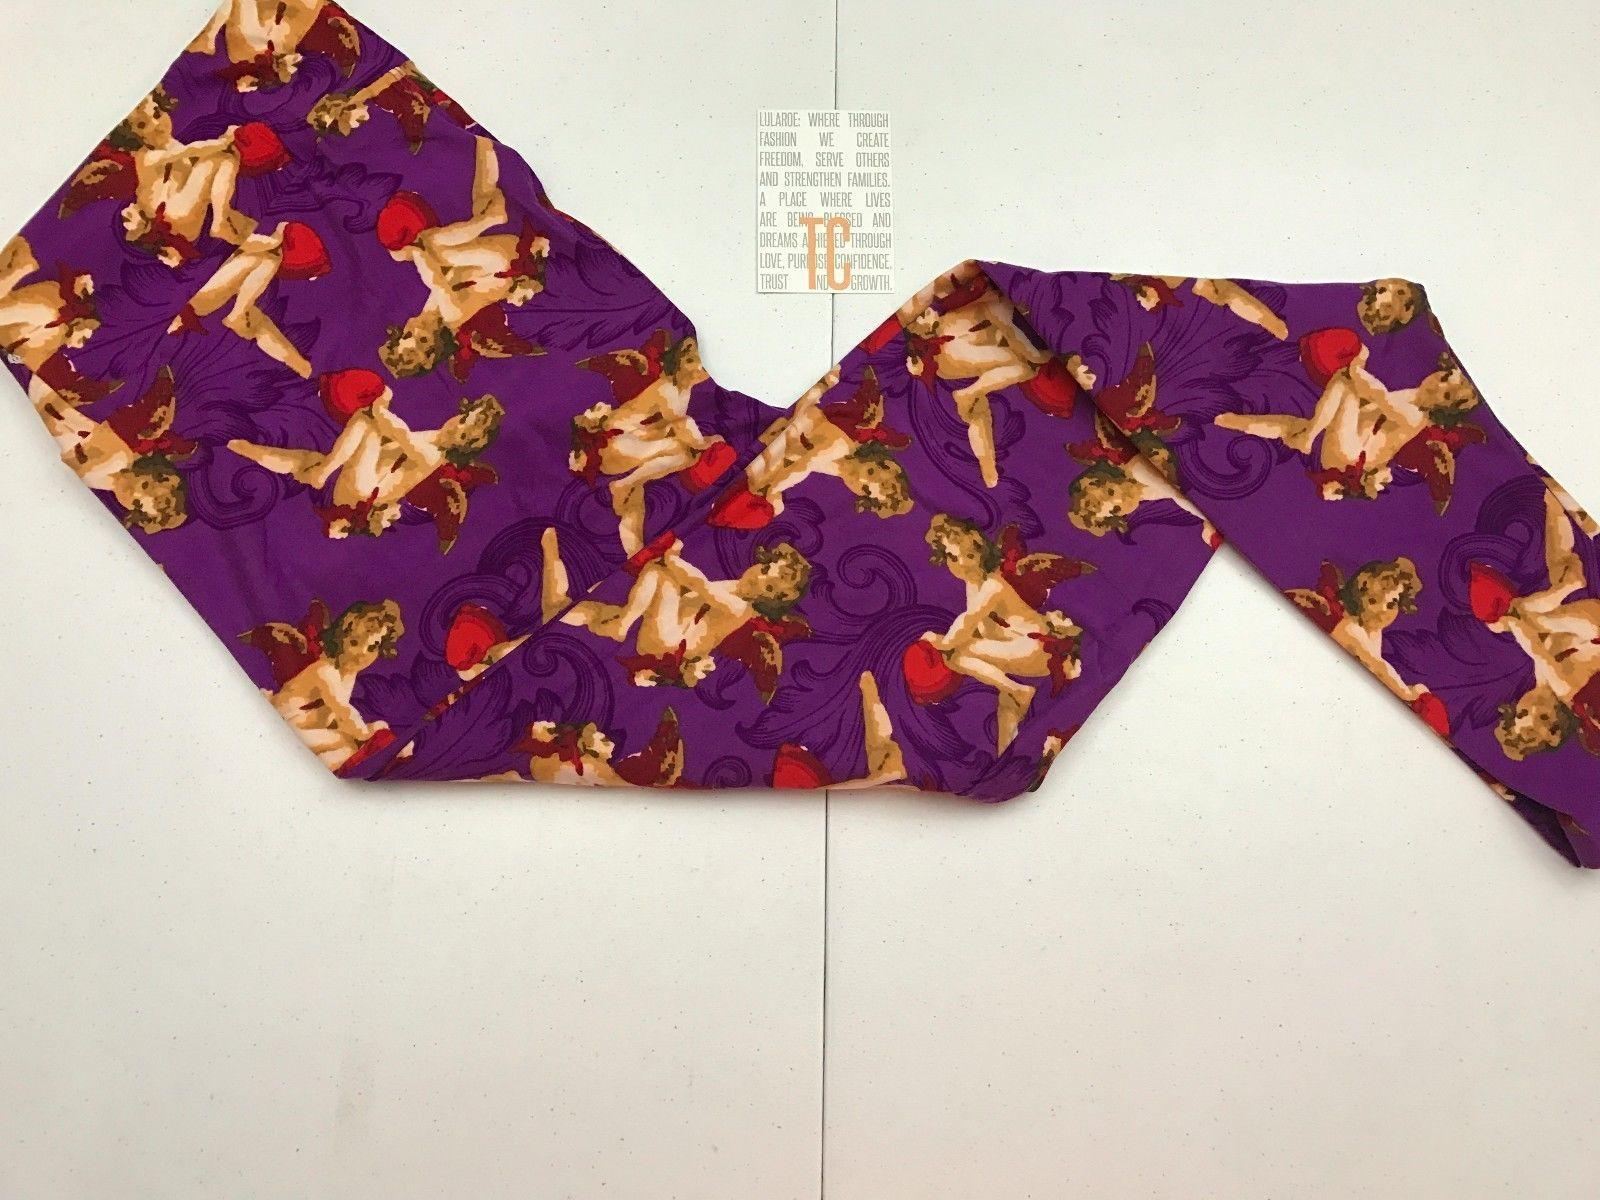 #ValentinesDay LulaRoe Leggings-Tall & Curvy-Fast Free Shipping - Valentine's Day-Cupid #ValentinesDay